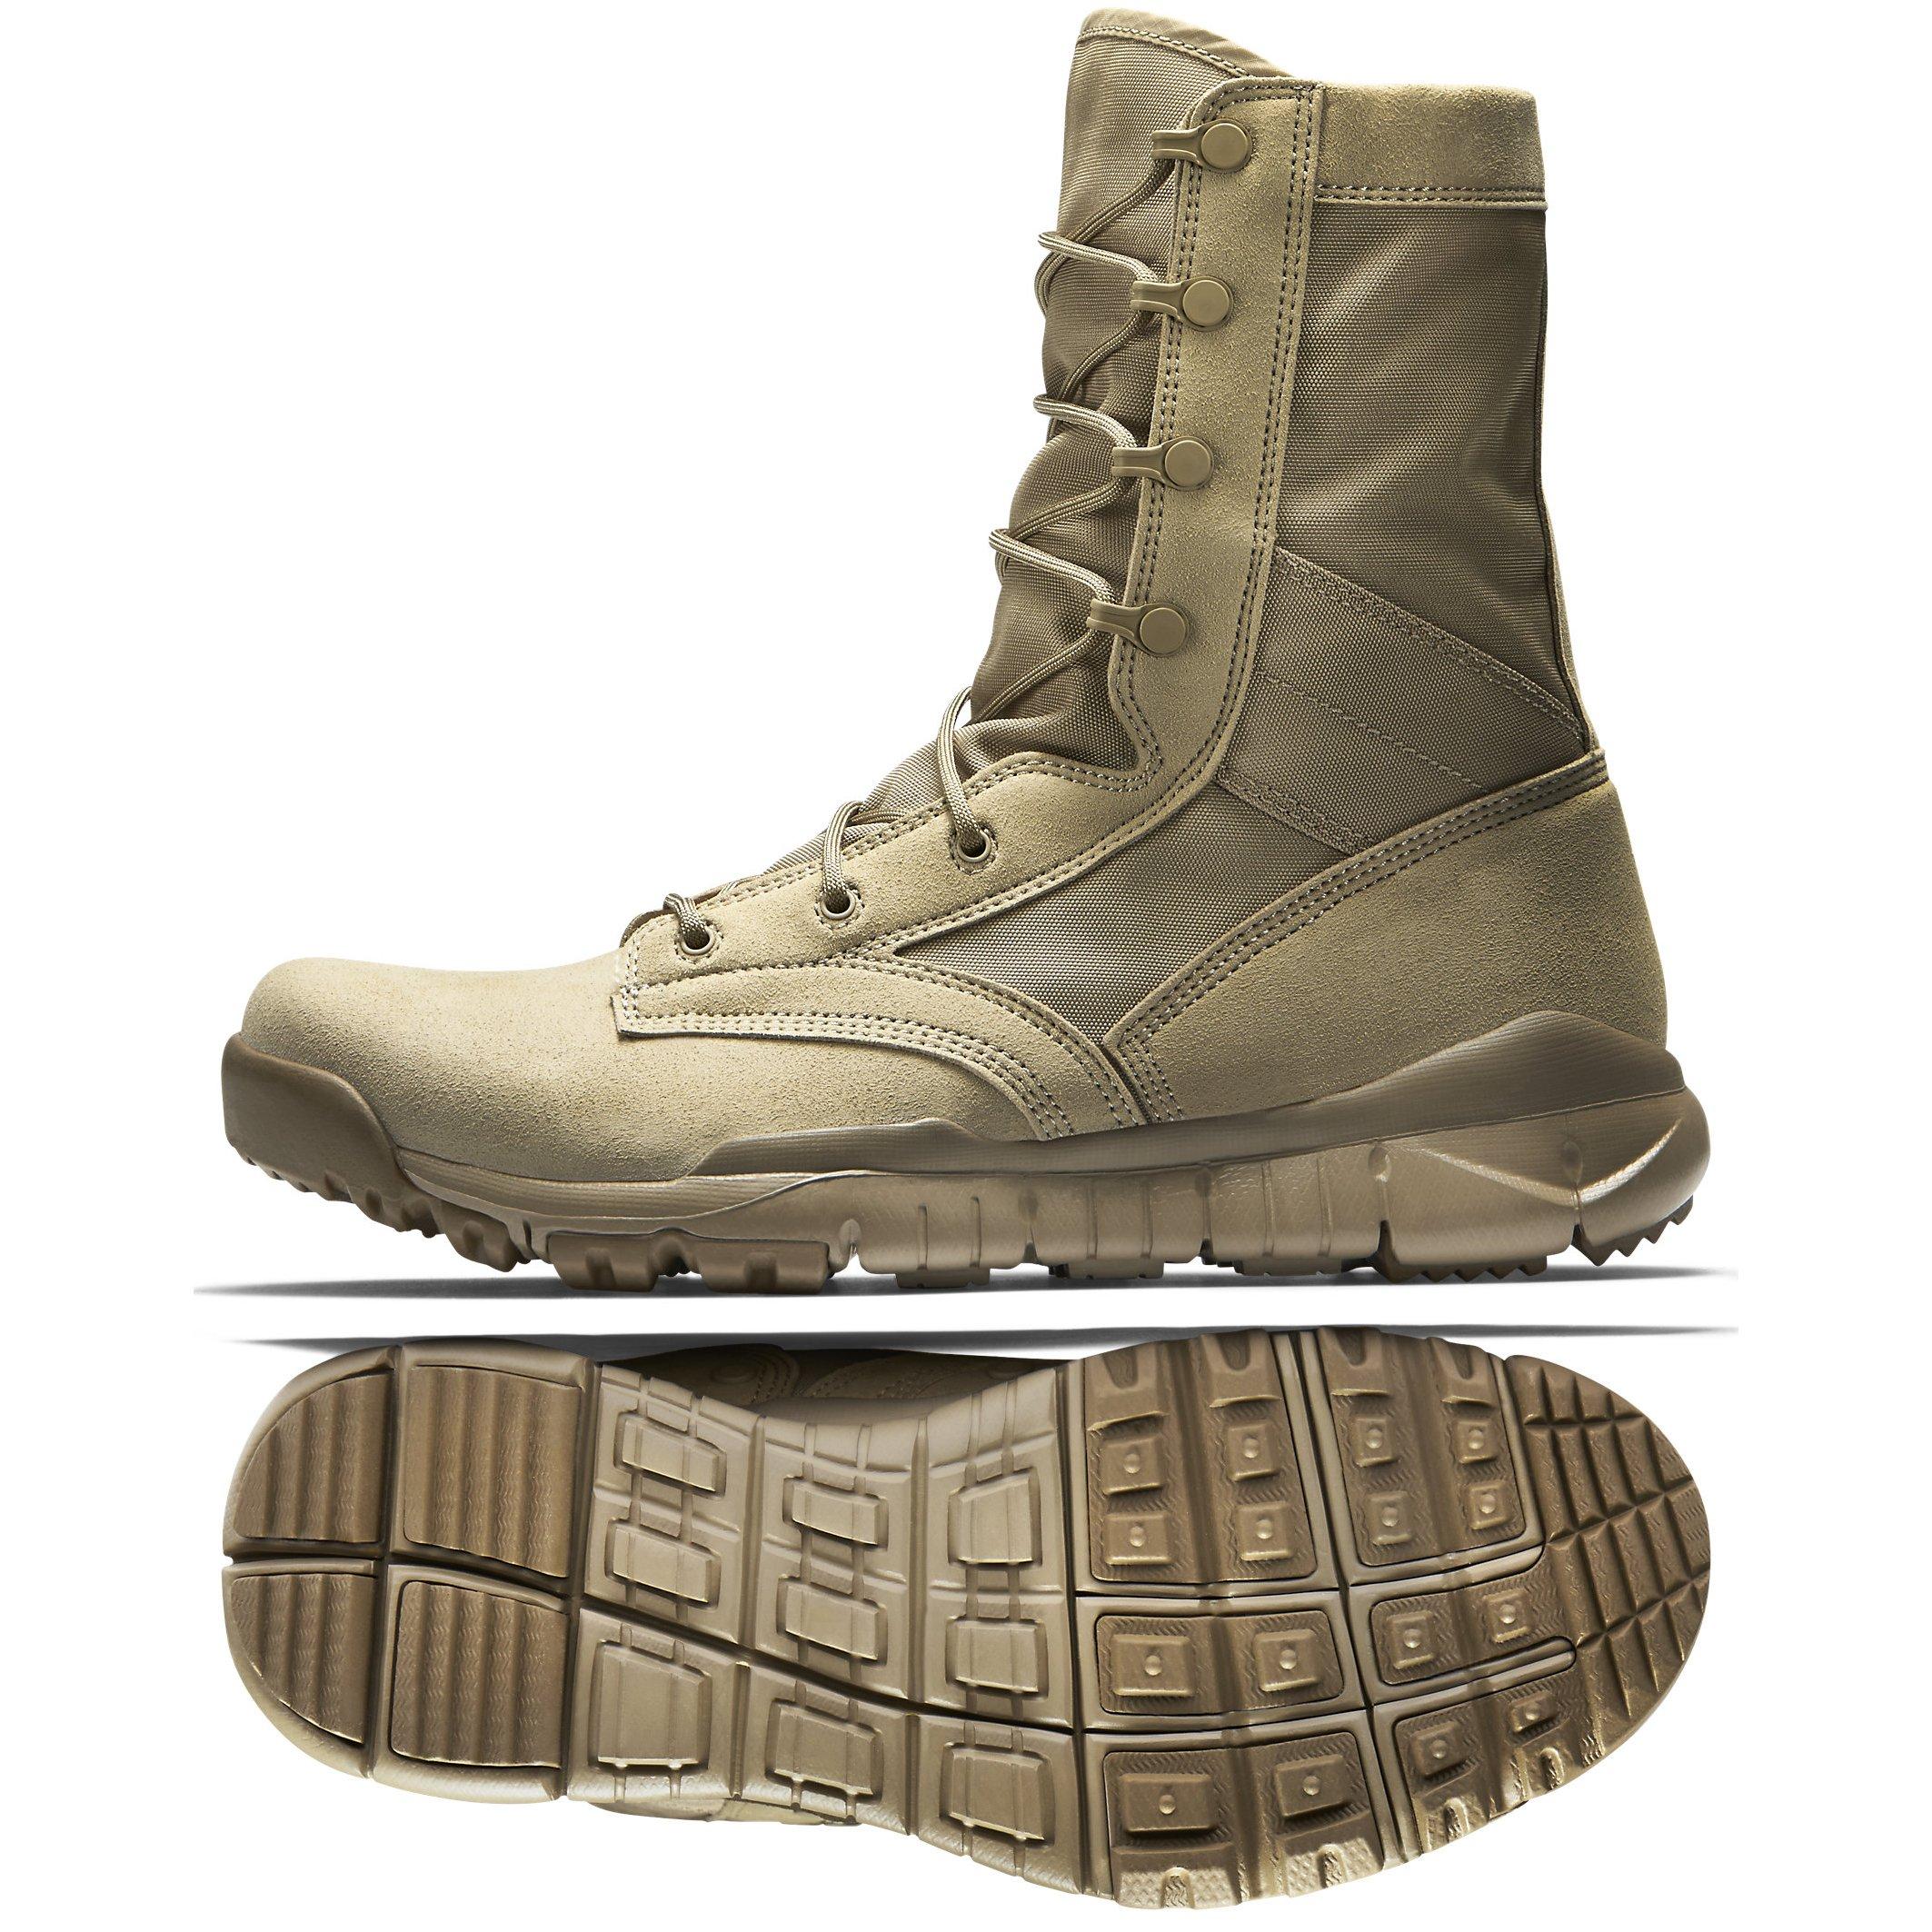 Nike SFB 329798-221 British Khaki/Desert Men's Special Field Tactics Boots (12.5 D(M) US)